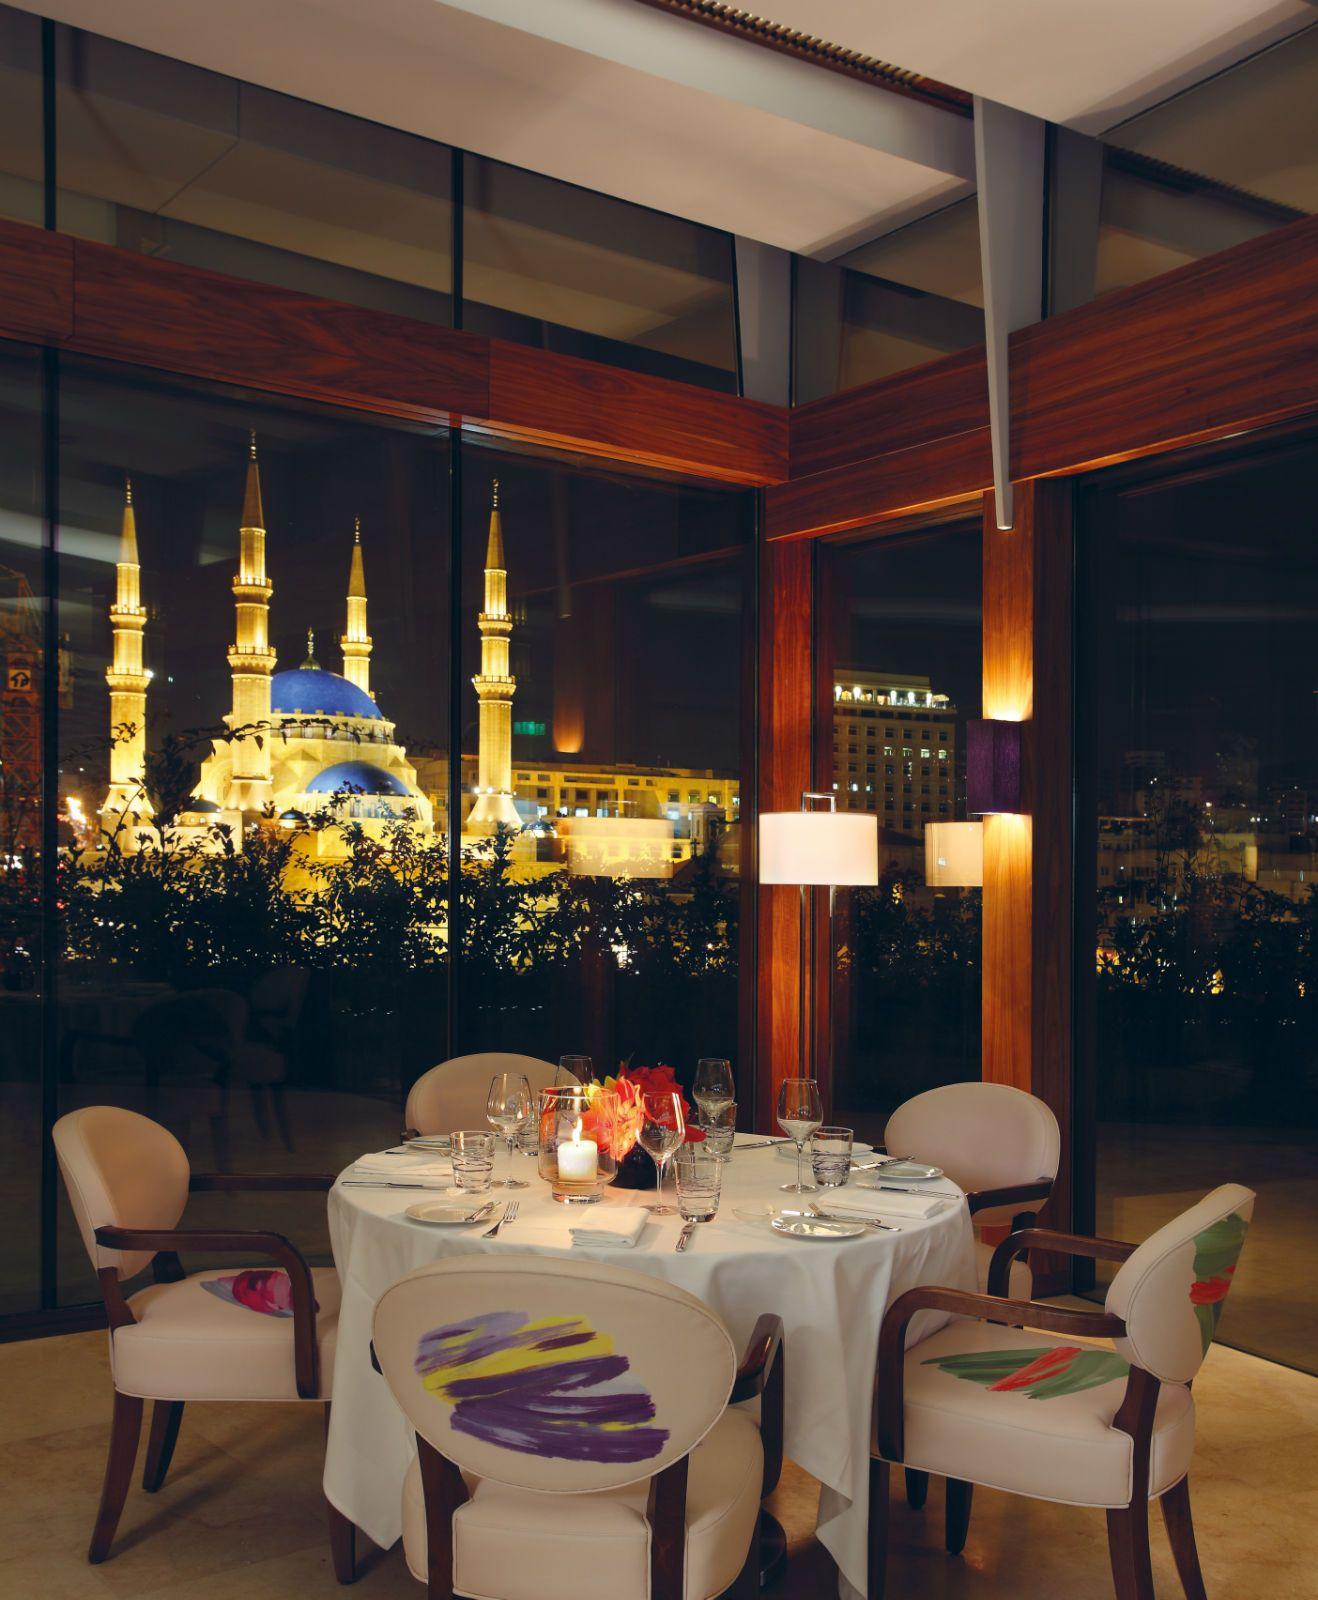 Indigo On The Roof Le Grey Beirut Beirut Romantic Restaurant Hotel